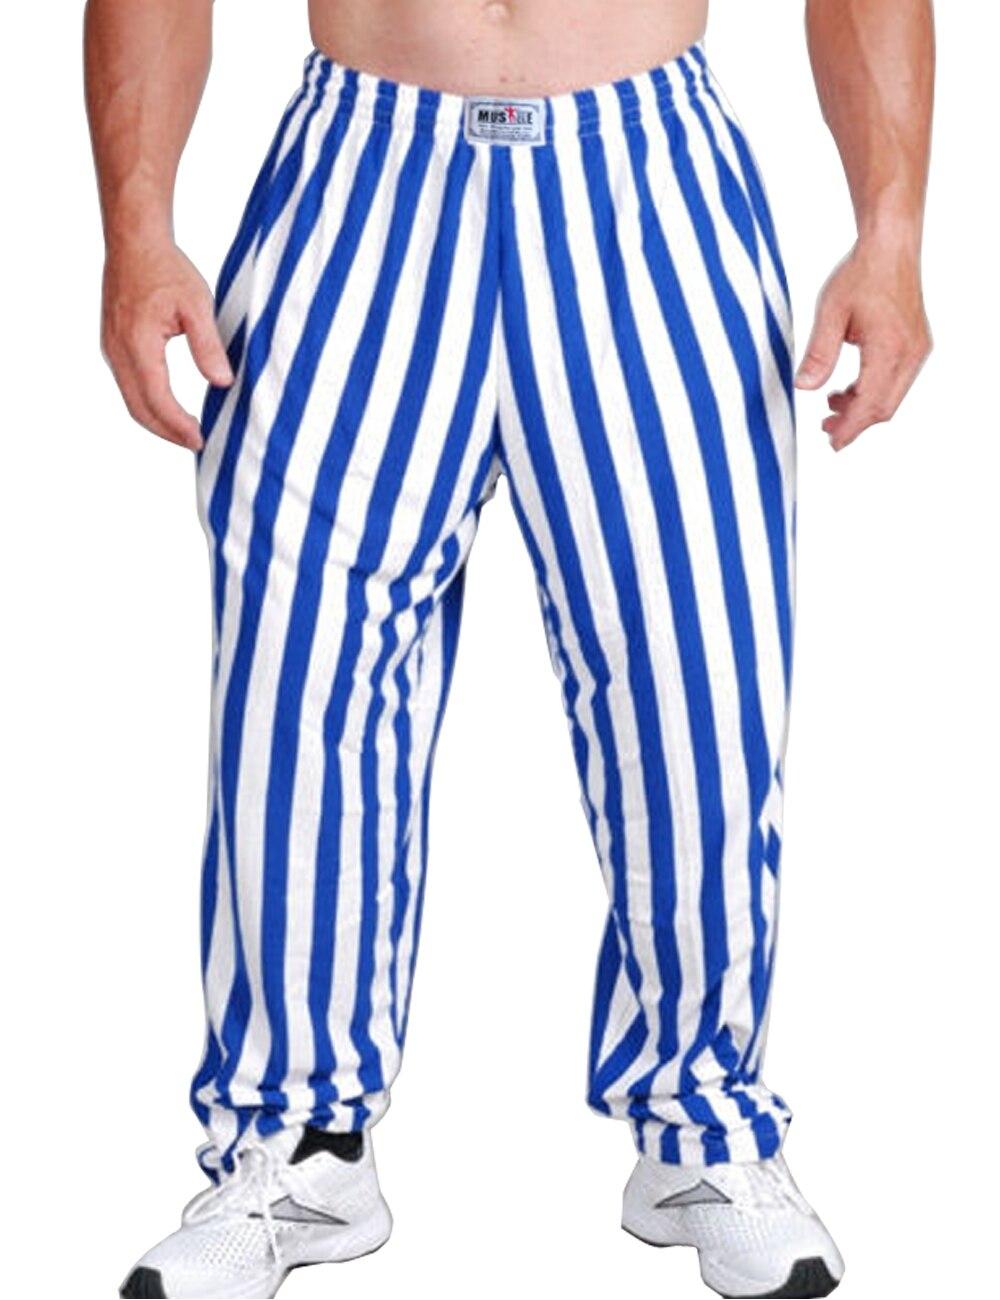 pantalon homme musculation